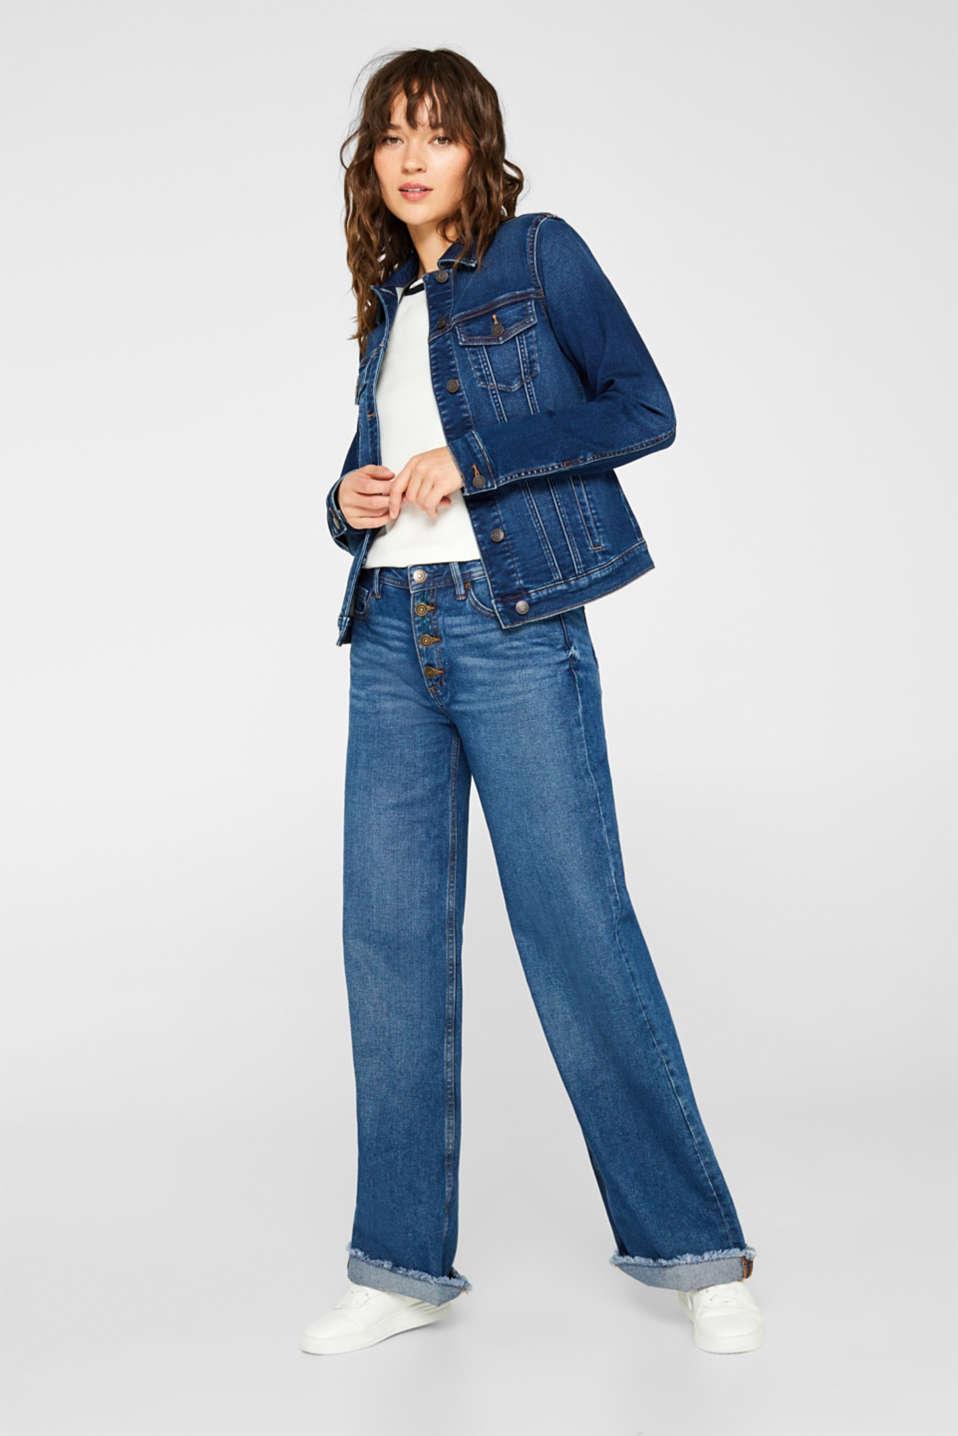 Jackets indoor denim, BLUE DARK WASH, detail image number 1